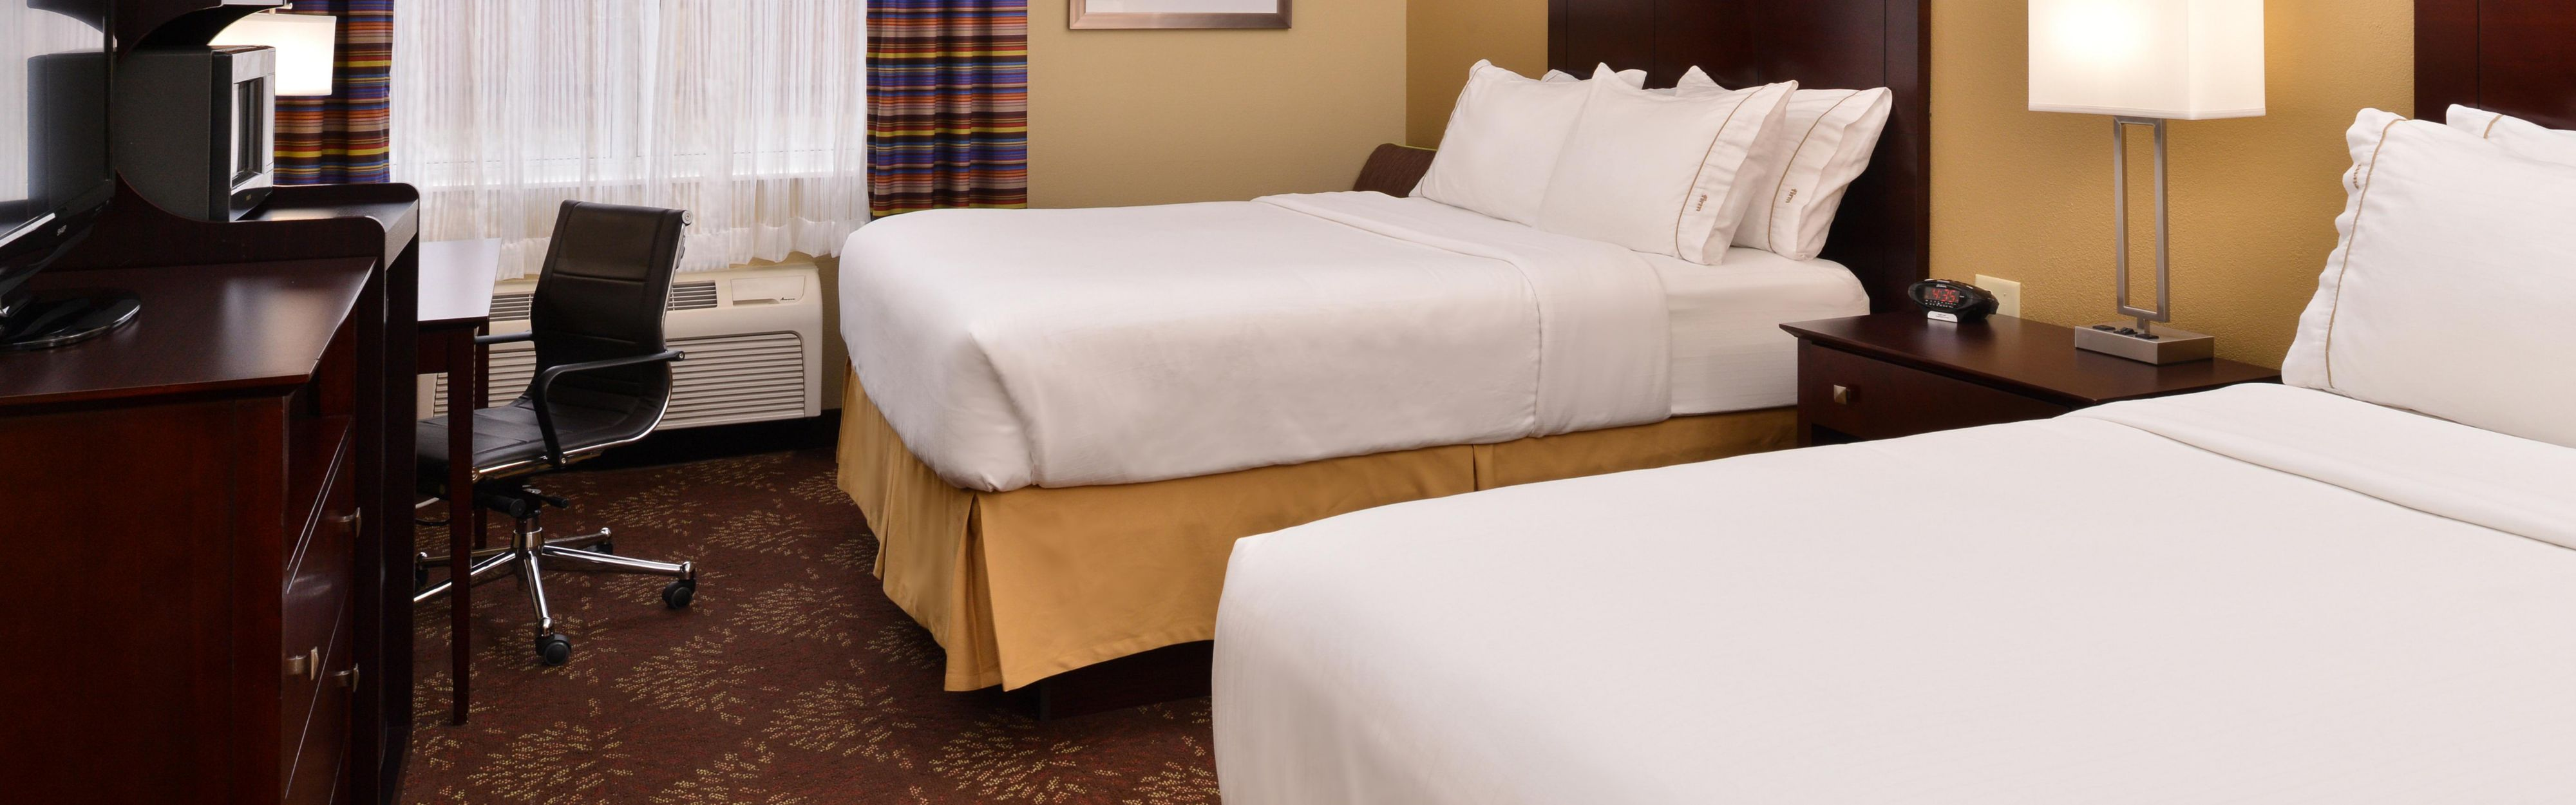 Holiday Inn Express Cincinnati-N/Sharonville image 1